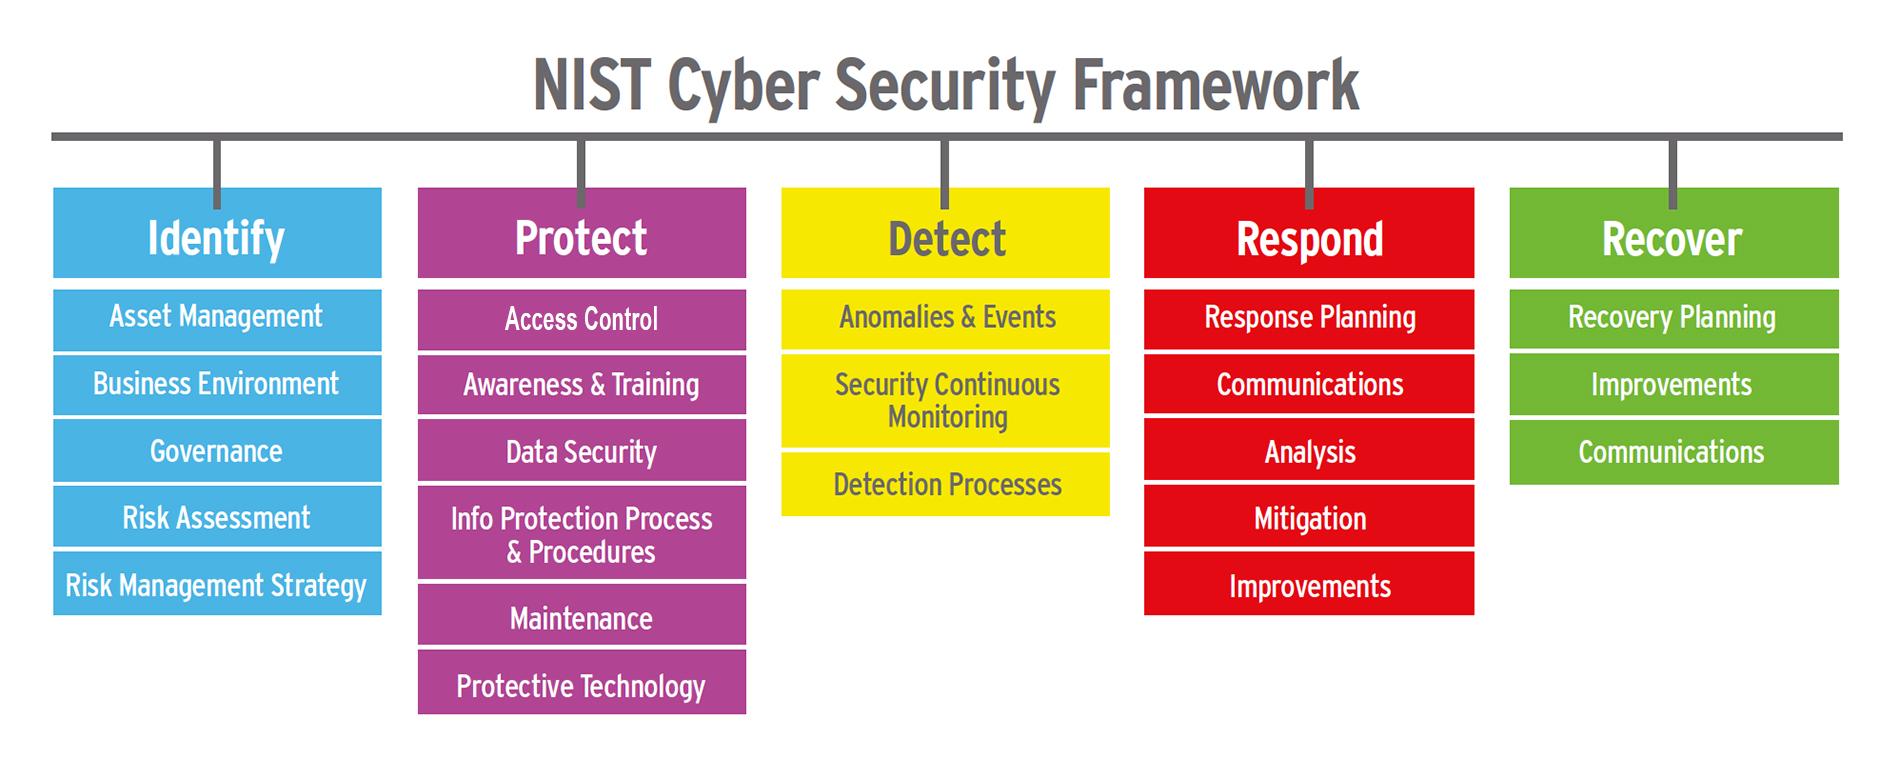 Network Security Company Boston, MA